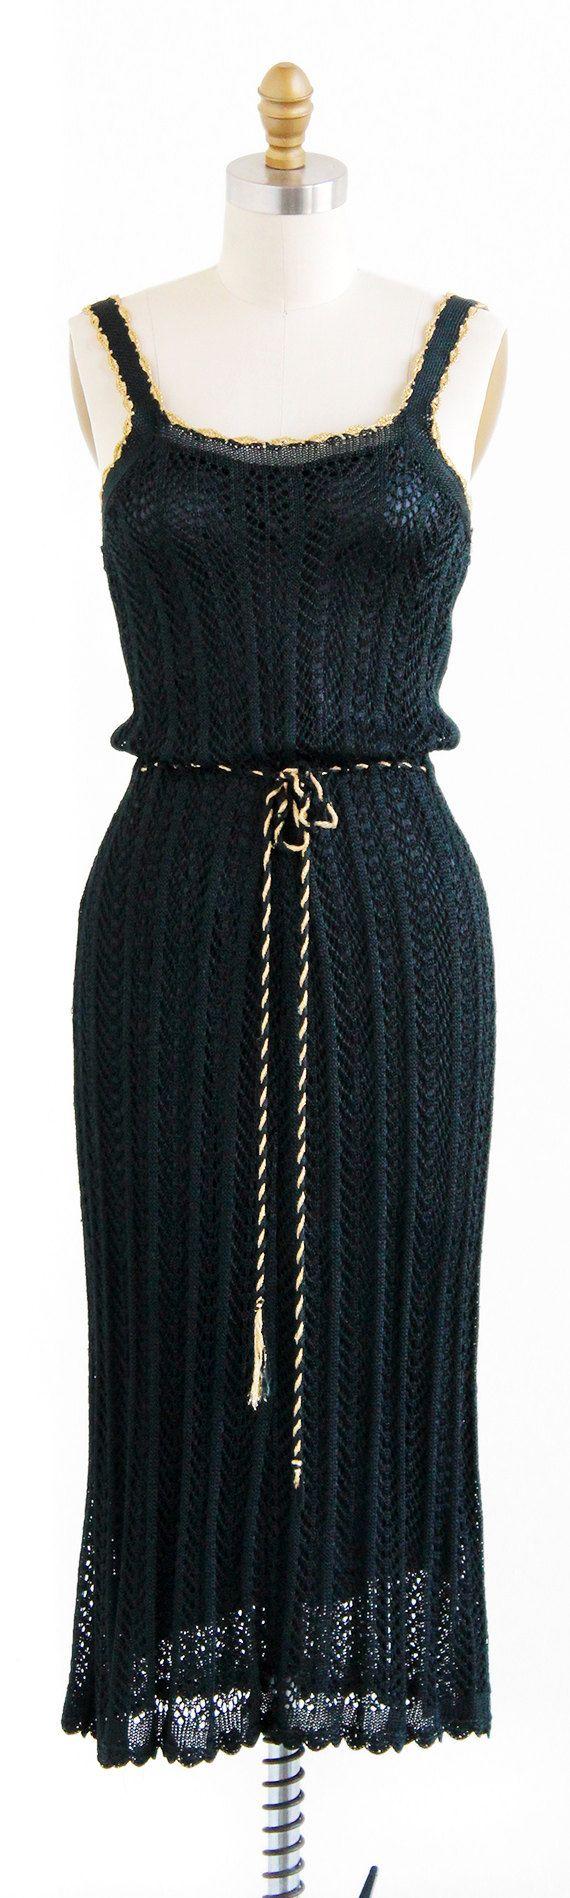 vintage 1970s slinky black + gold crocheted evening dress | http://www.rococovintage.com